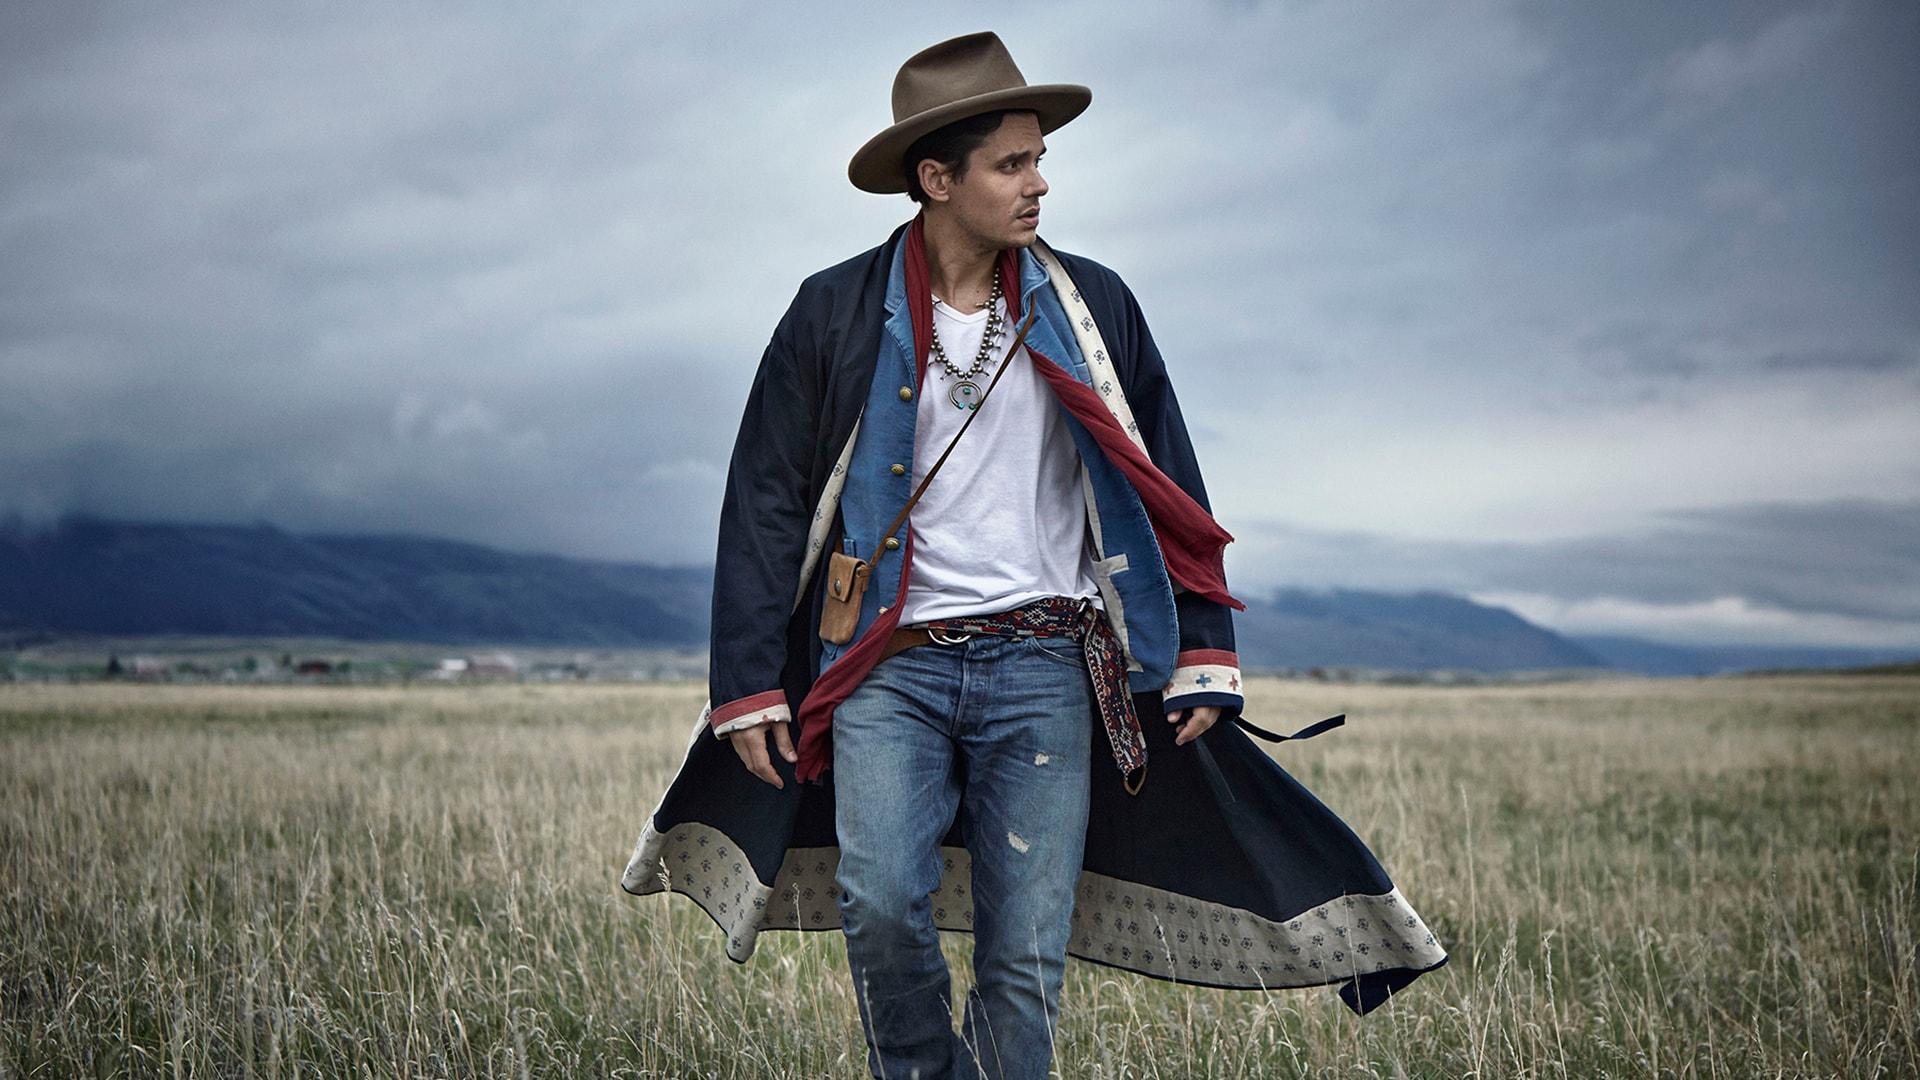 John Mayer Backgrounds